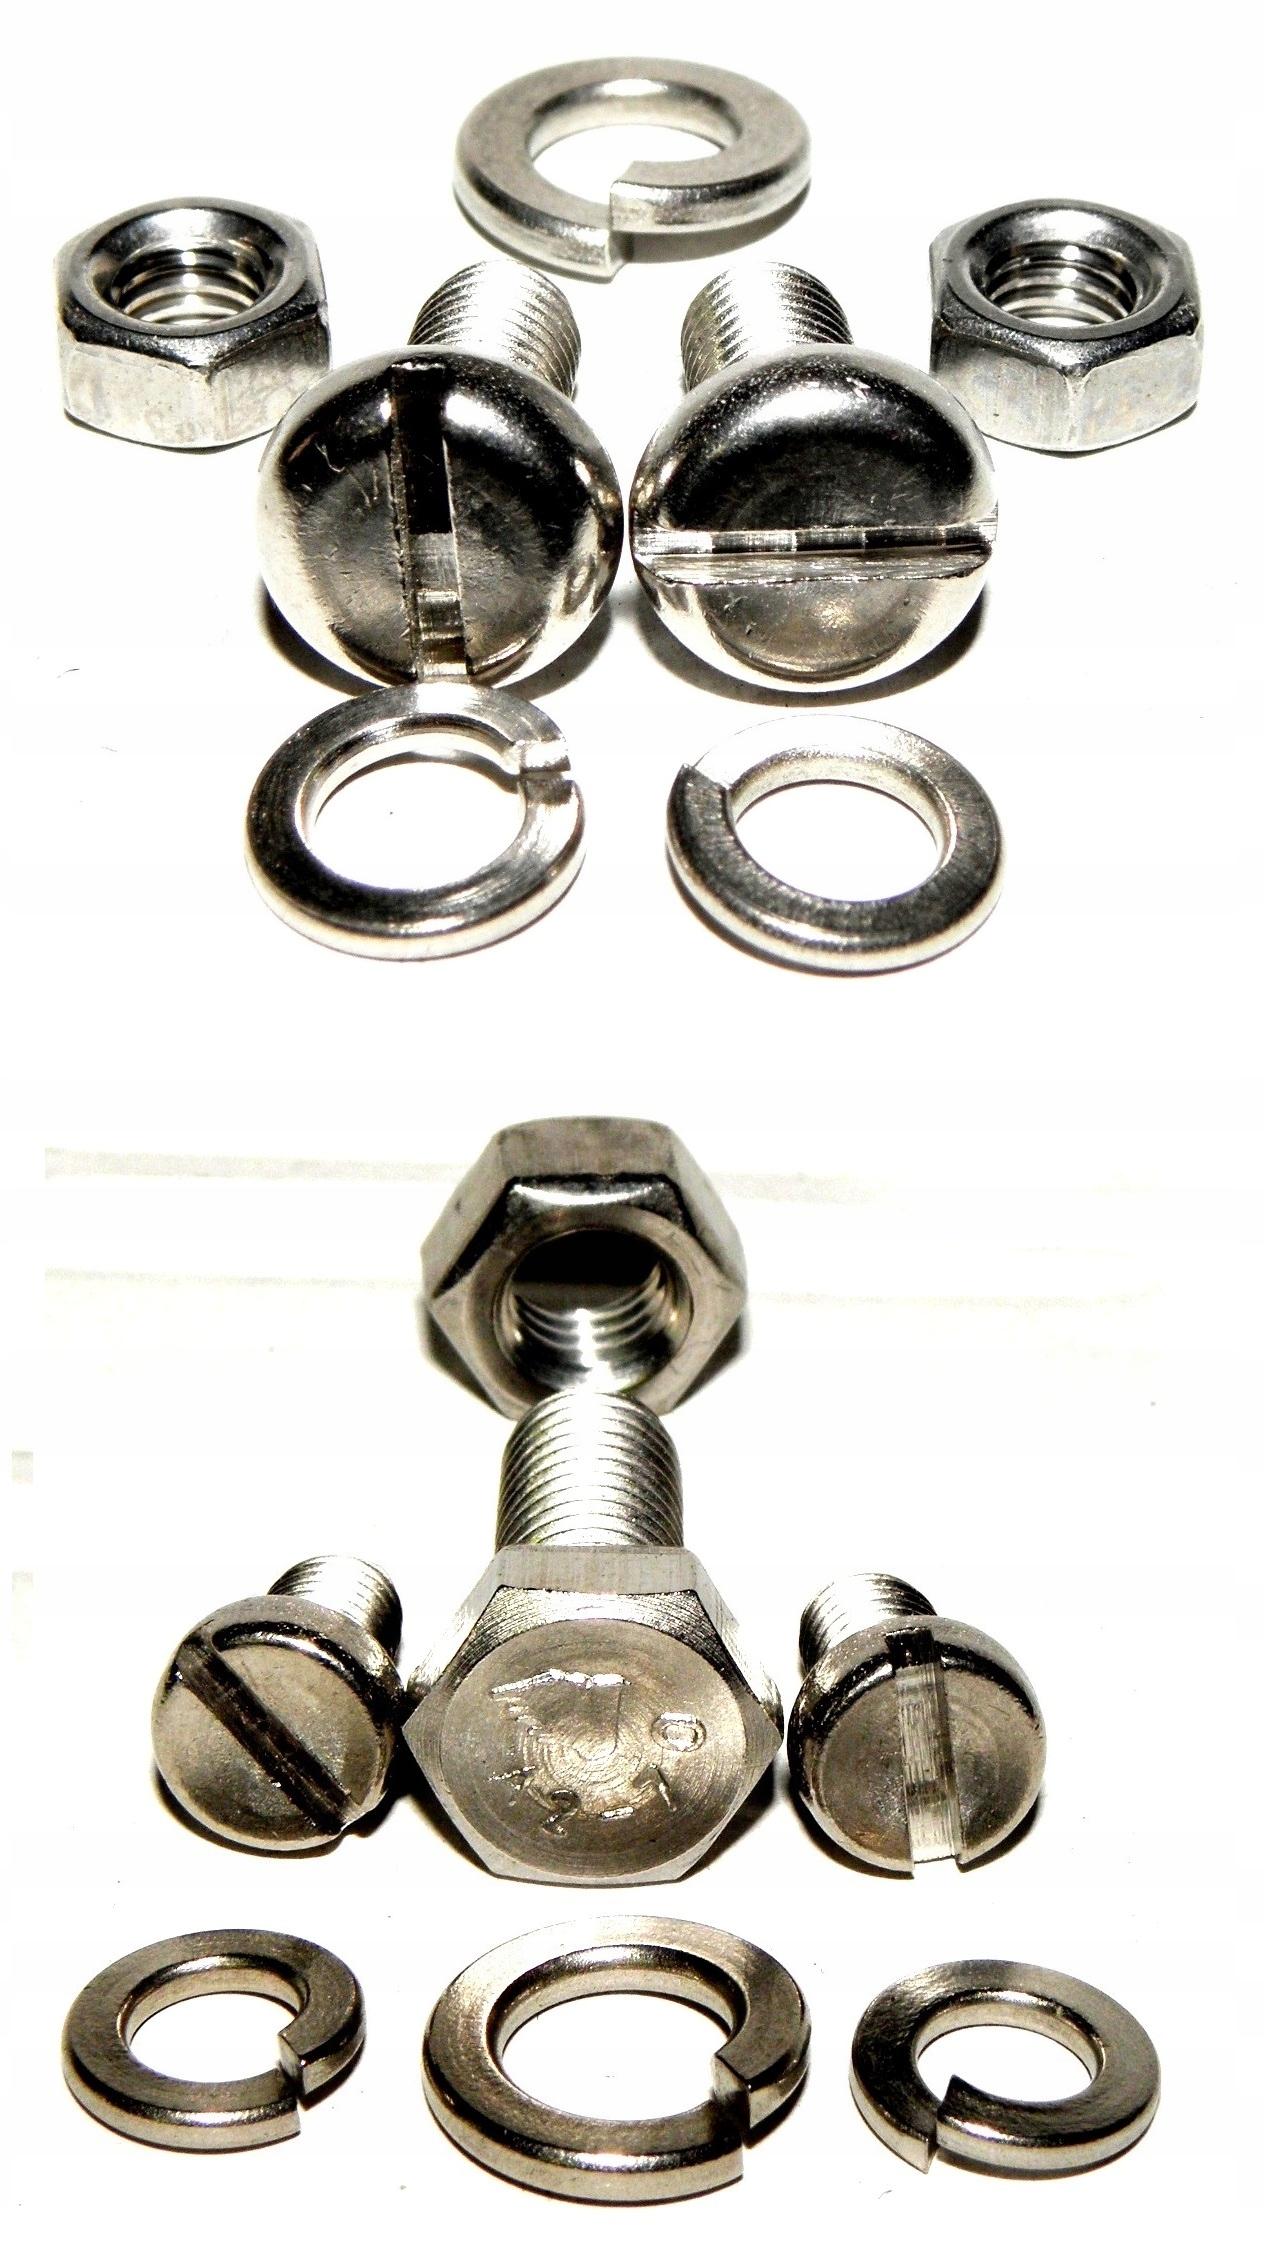 A SET BOLT WSK 125 M06 B3 + LANTERN HANDLES